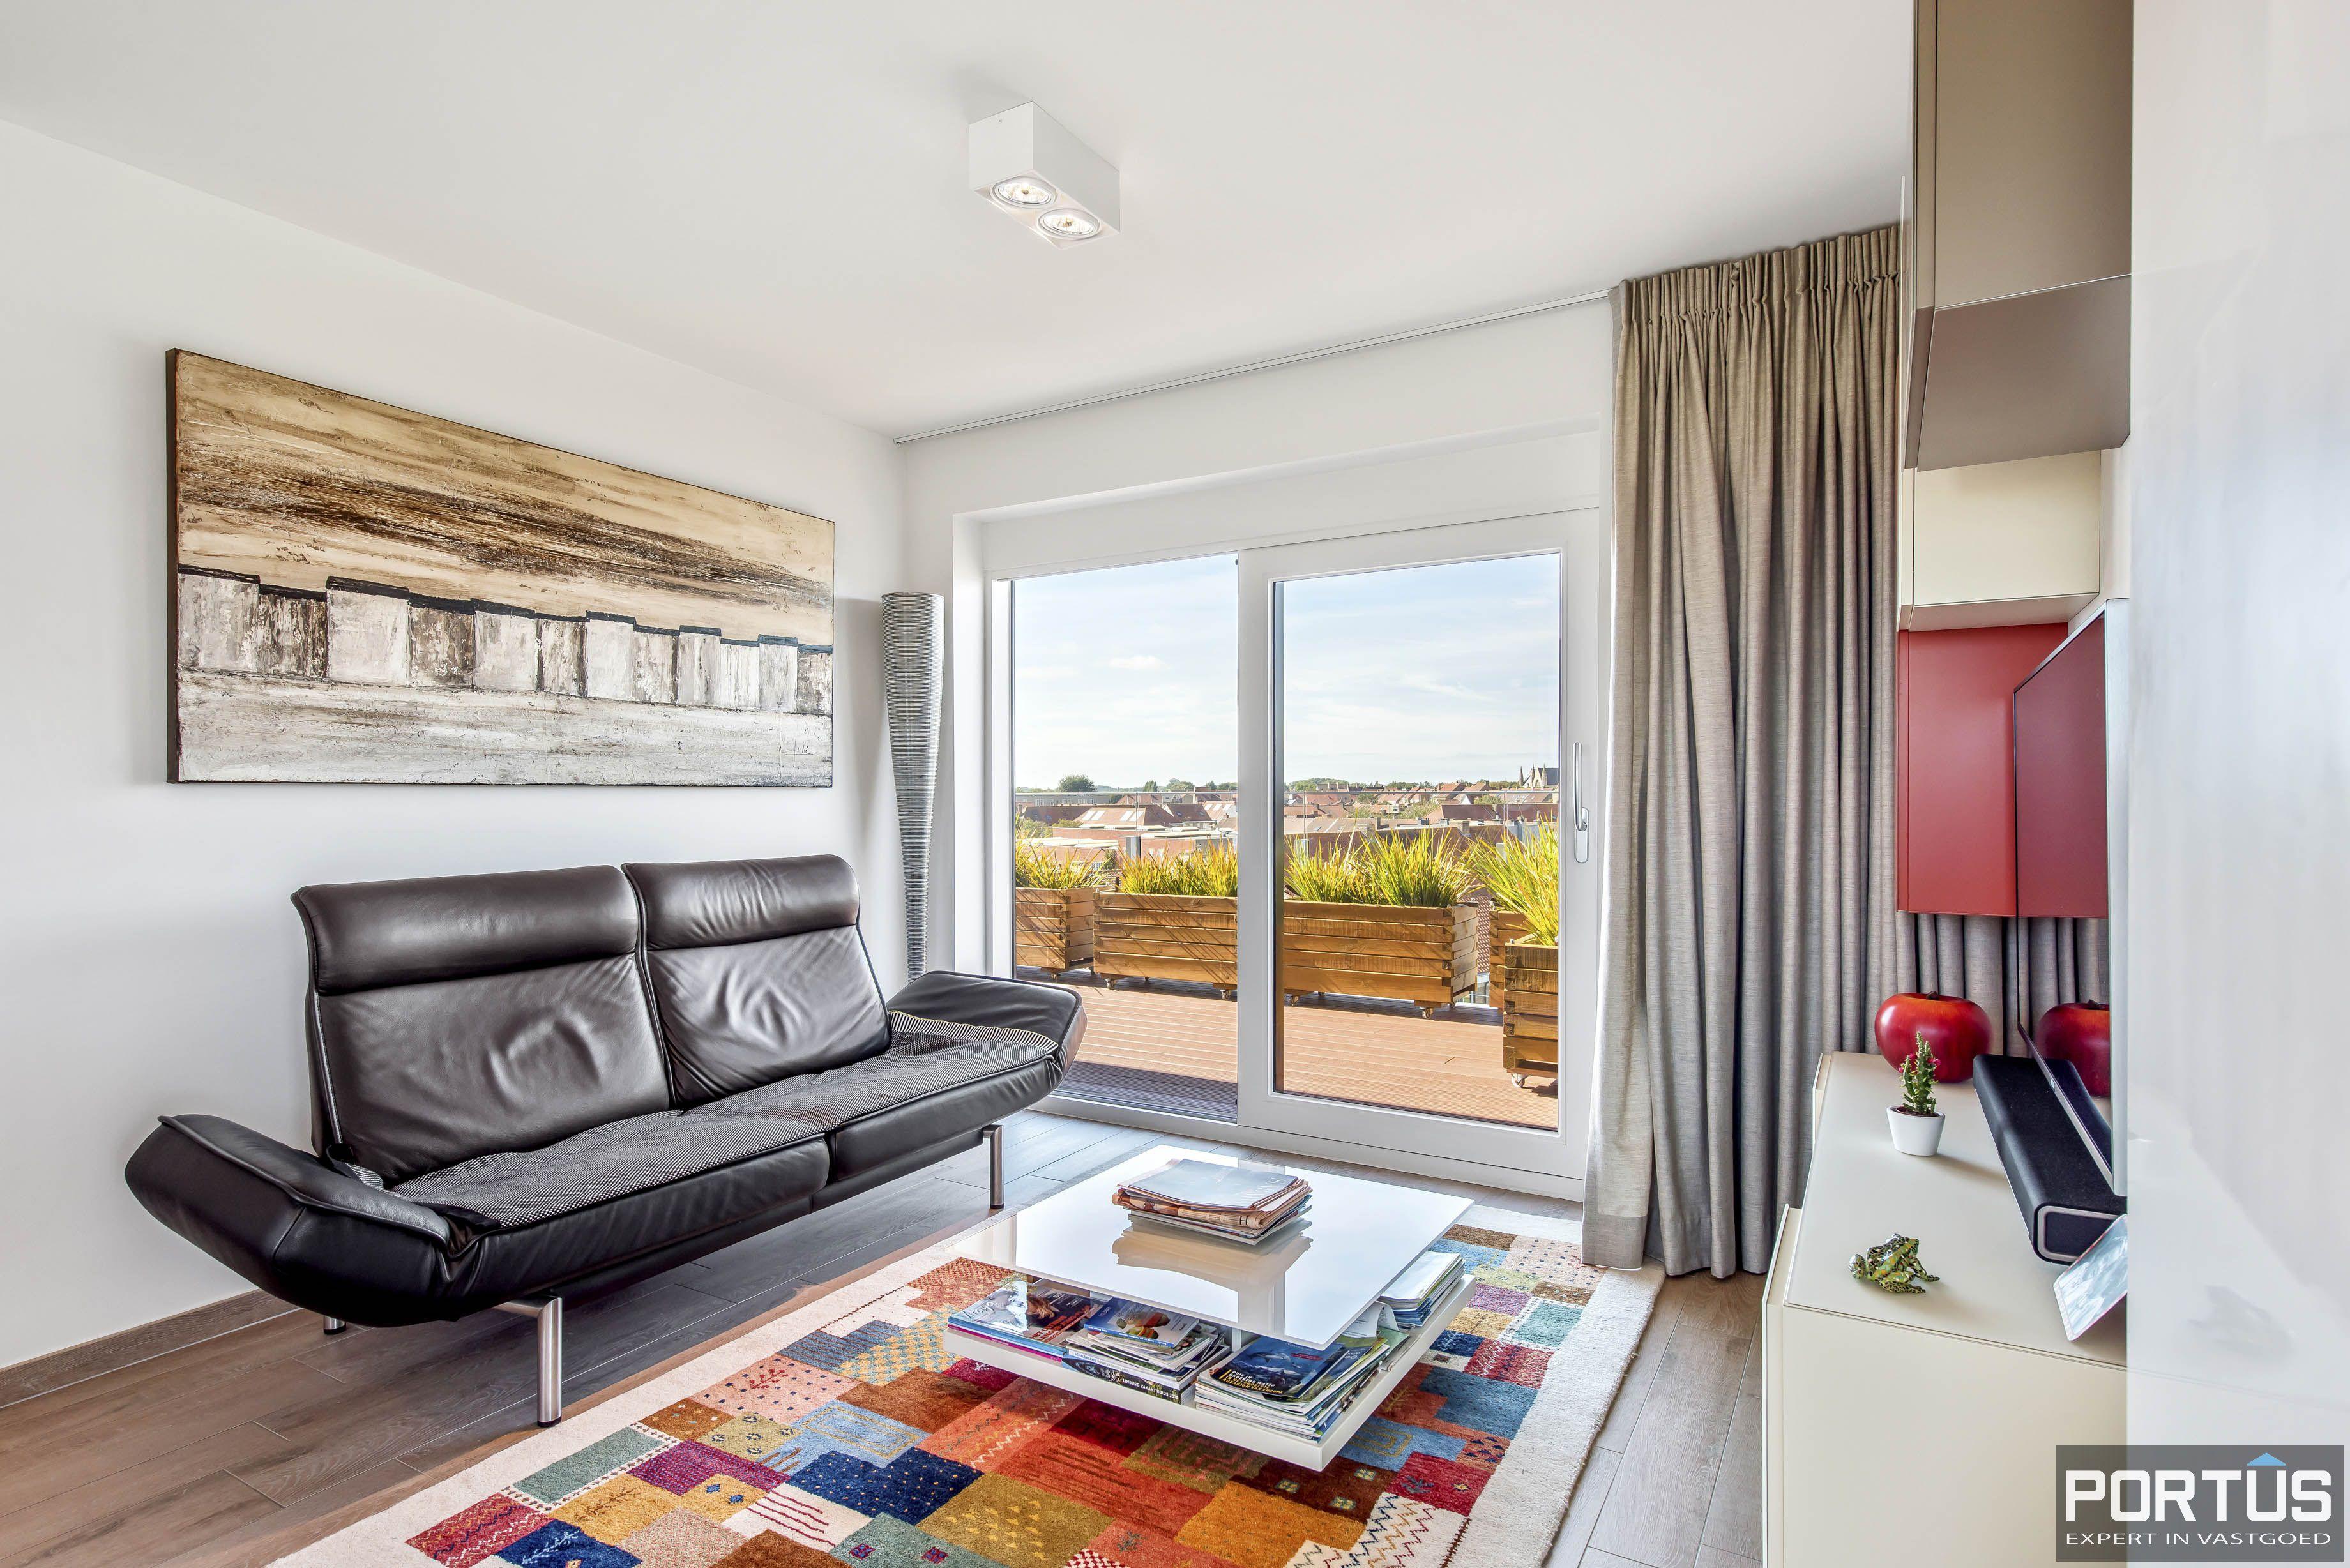 Exclusieve penthouse met 3 slaapkamers te koop te Nieuwpoort - 10945